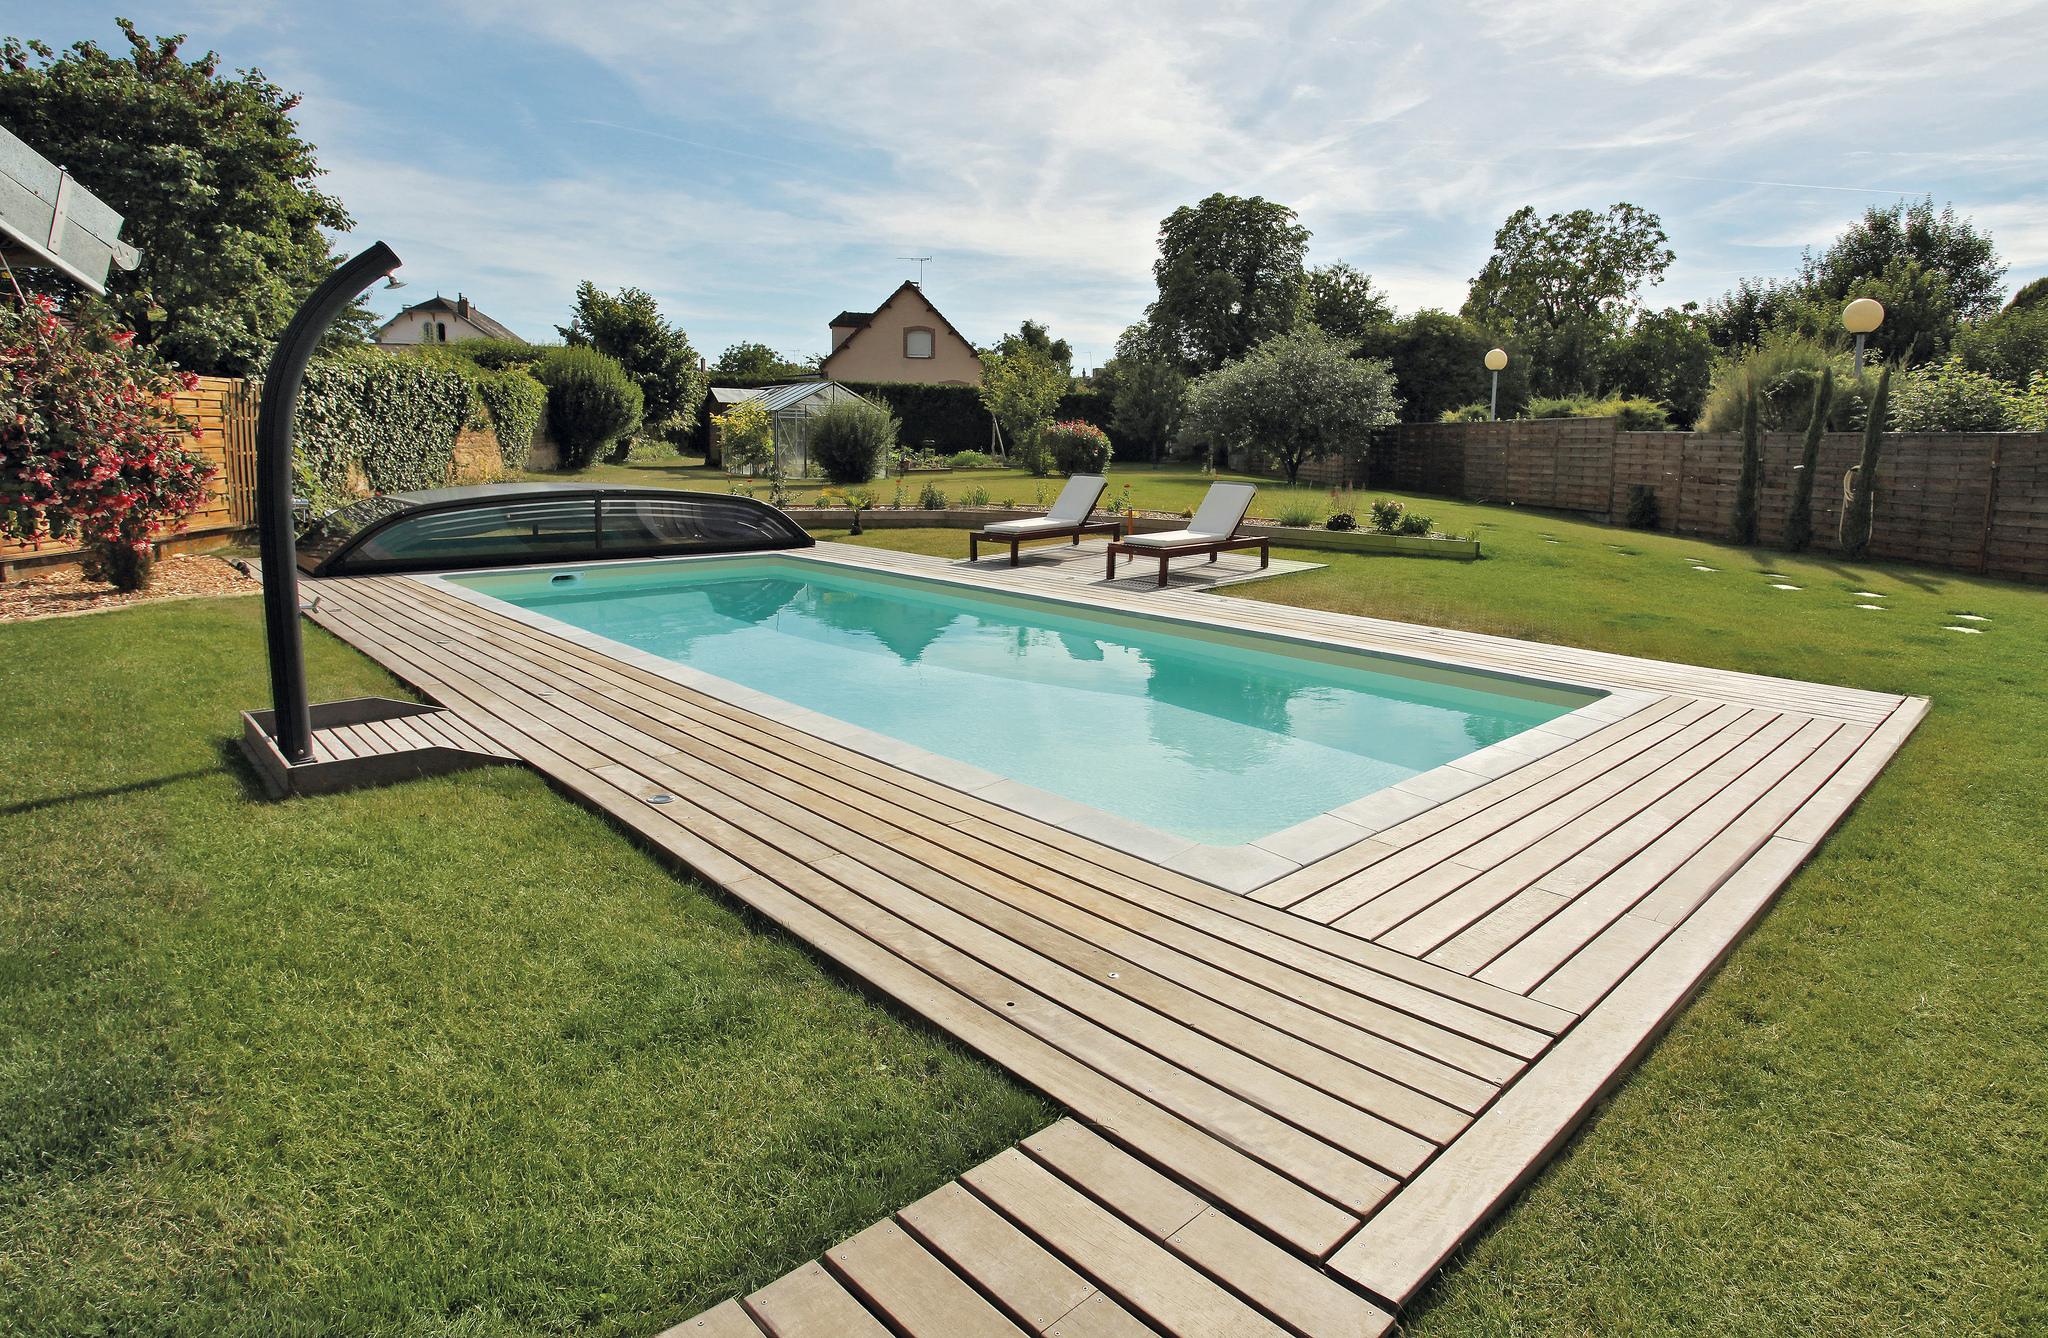 Niedrige pool berdachung desjoyaux pools for Pool komplettangebot